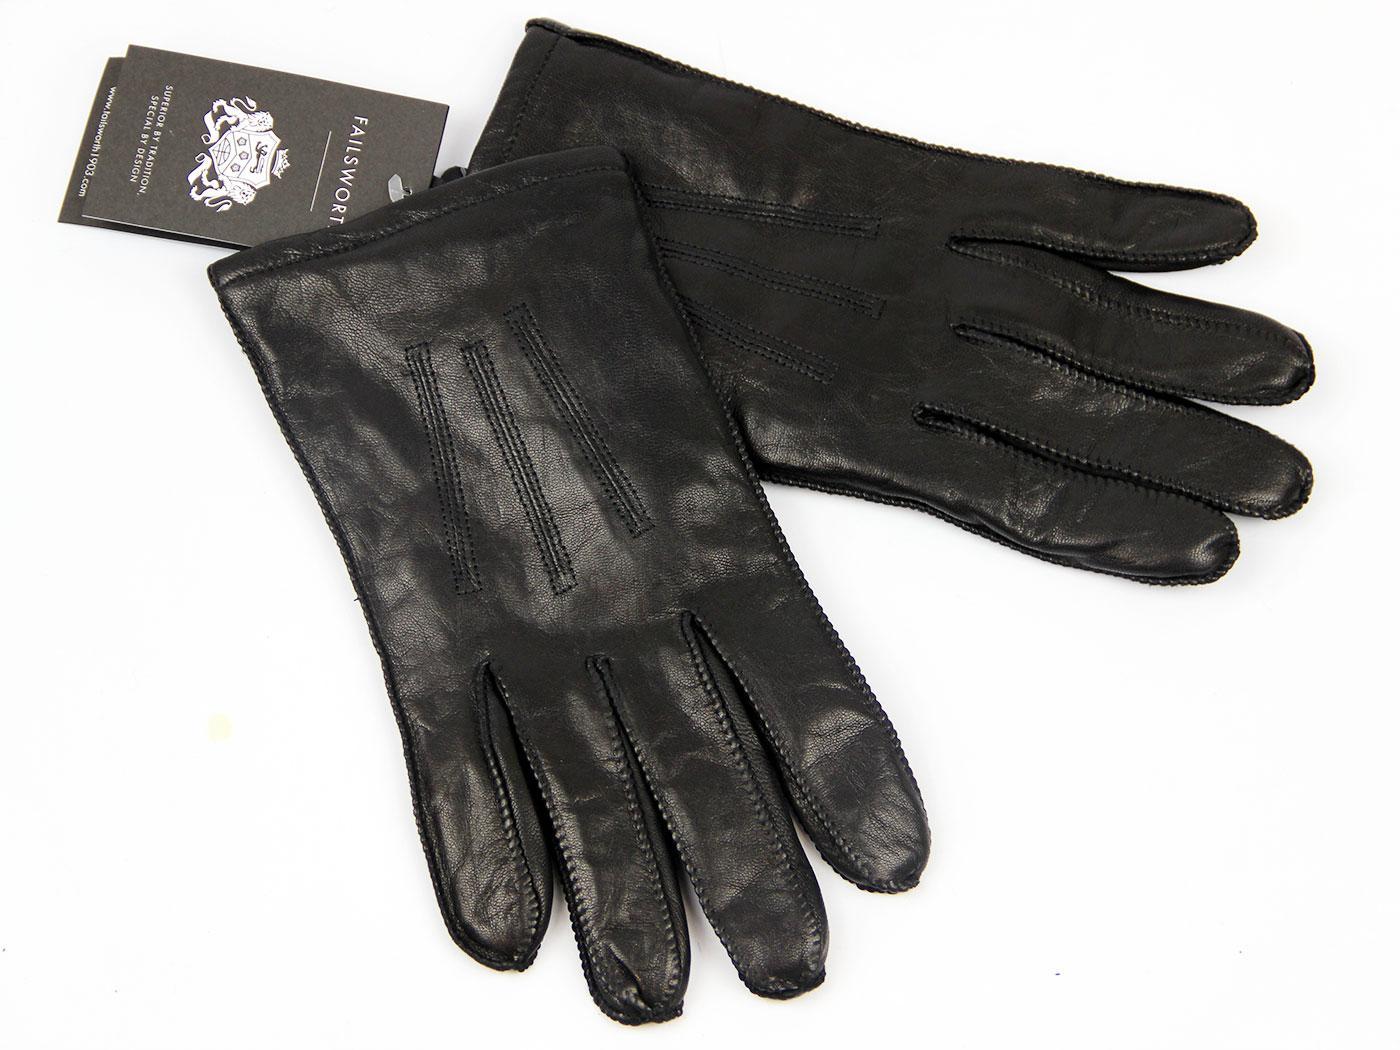 failsworth george retro 1970s vintage style leather gloves